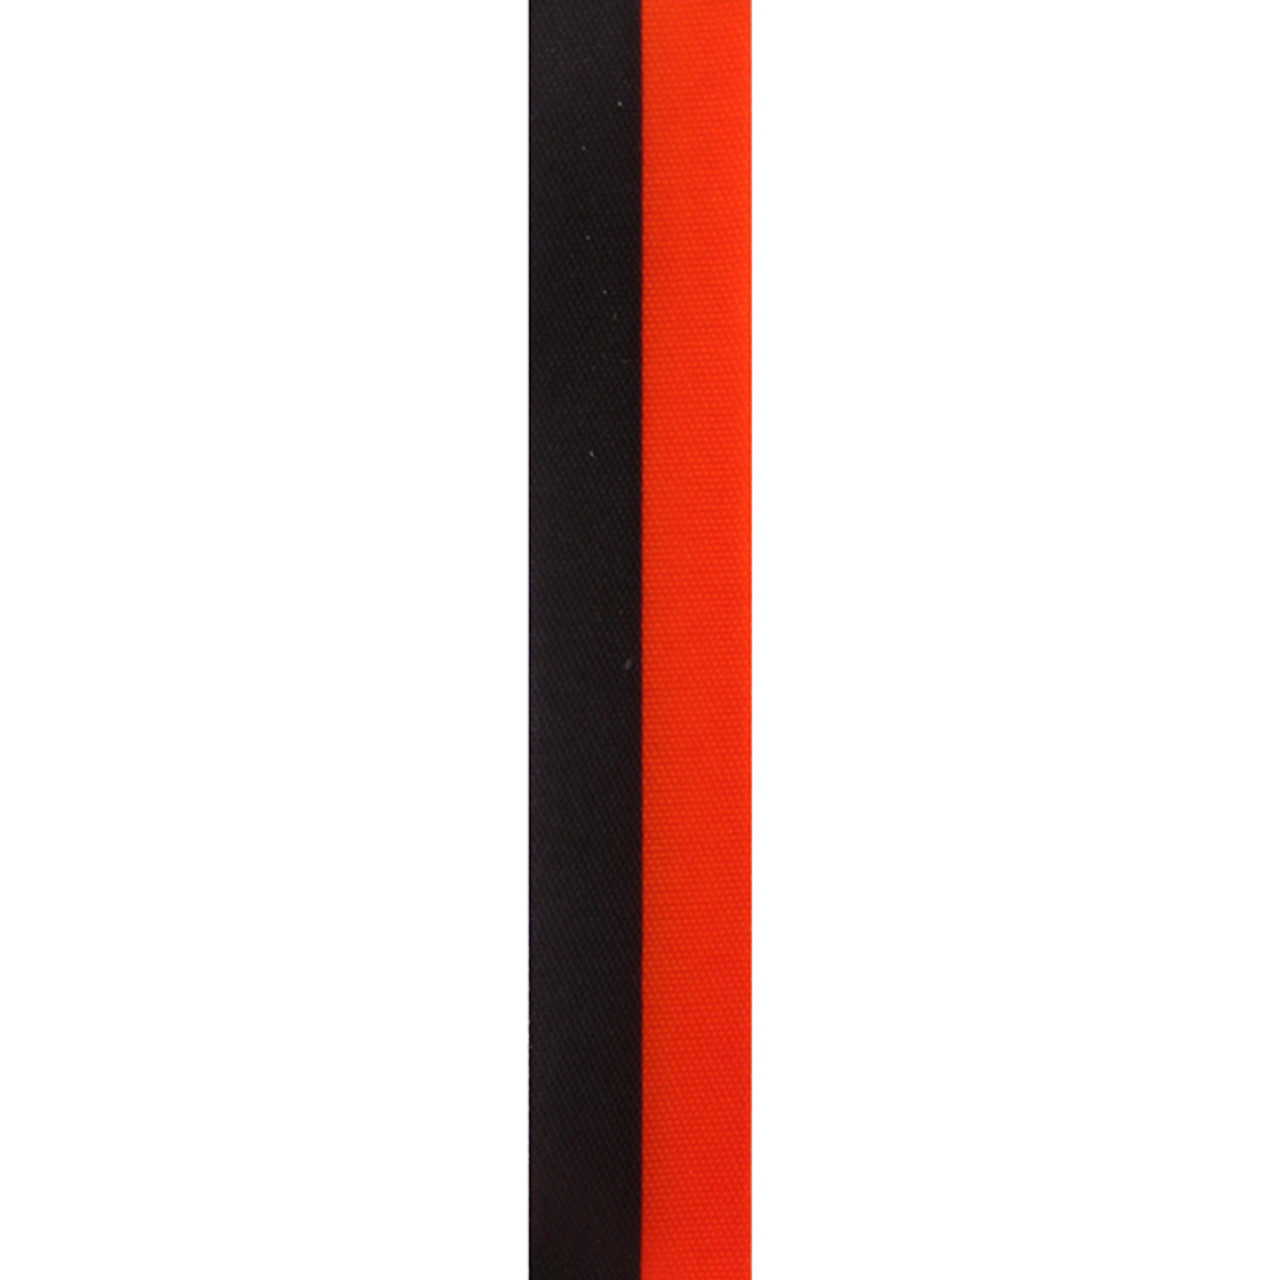 Orange and Black Vertical Striped Ribbon